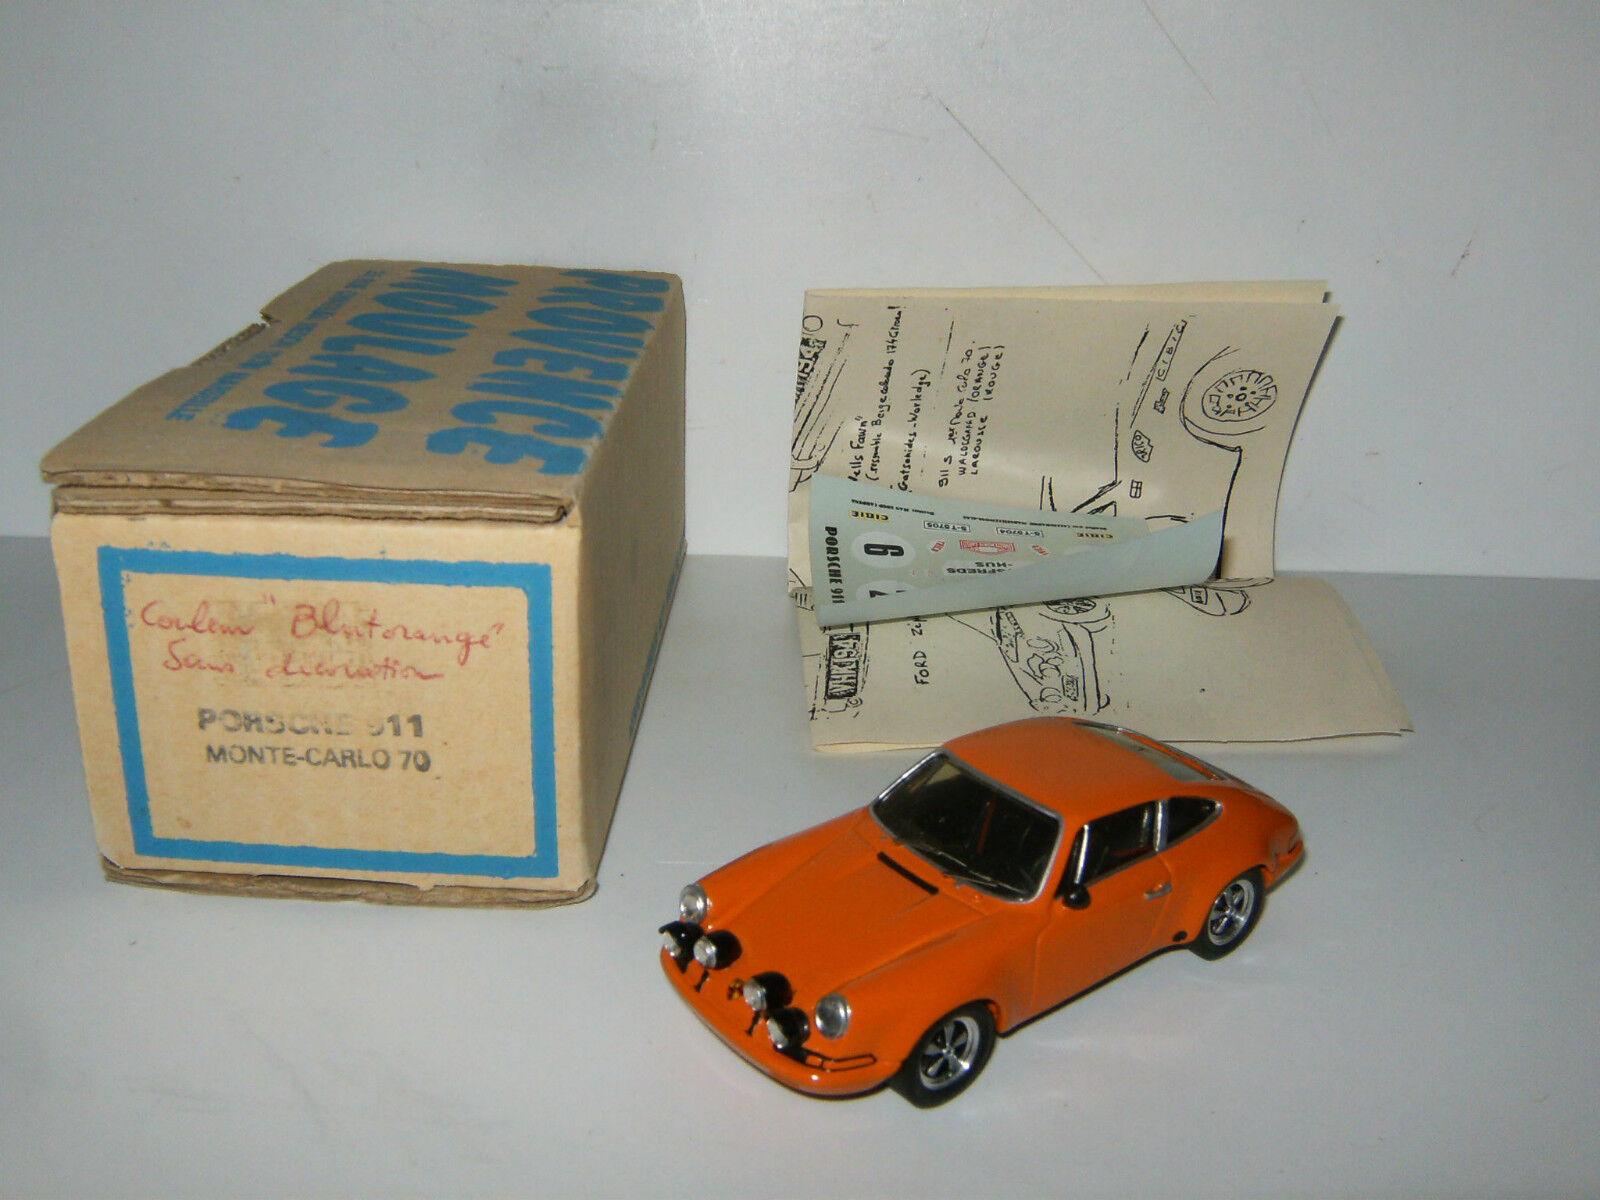 RARE PORSCHE 911 S Orange Monte Carlo 1970 1970 1970 N° 6 Rallye PROVENCE MOULAGE au 1 43 cc0d92